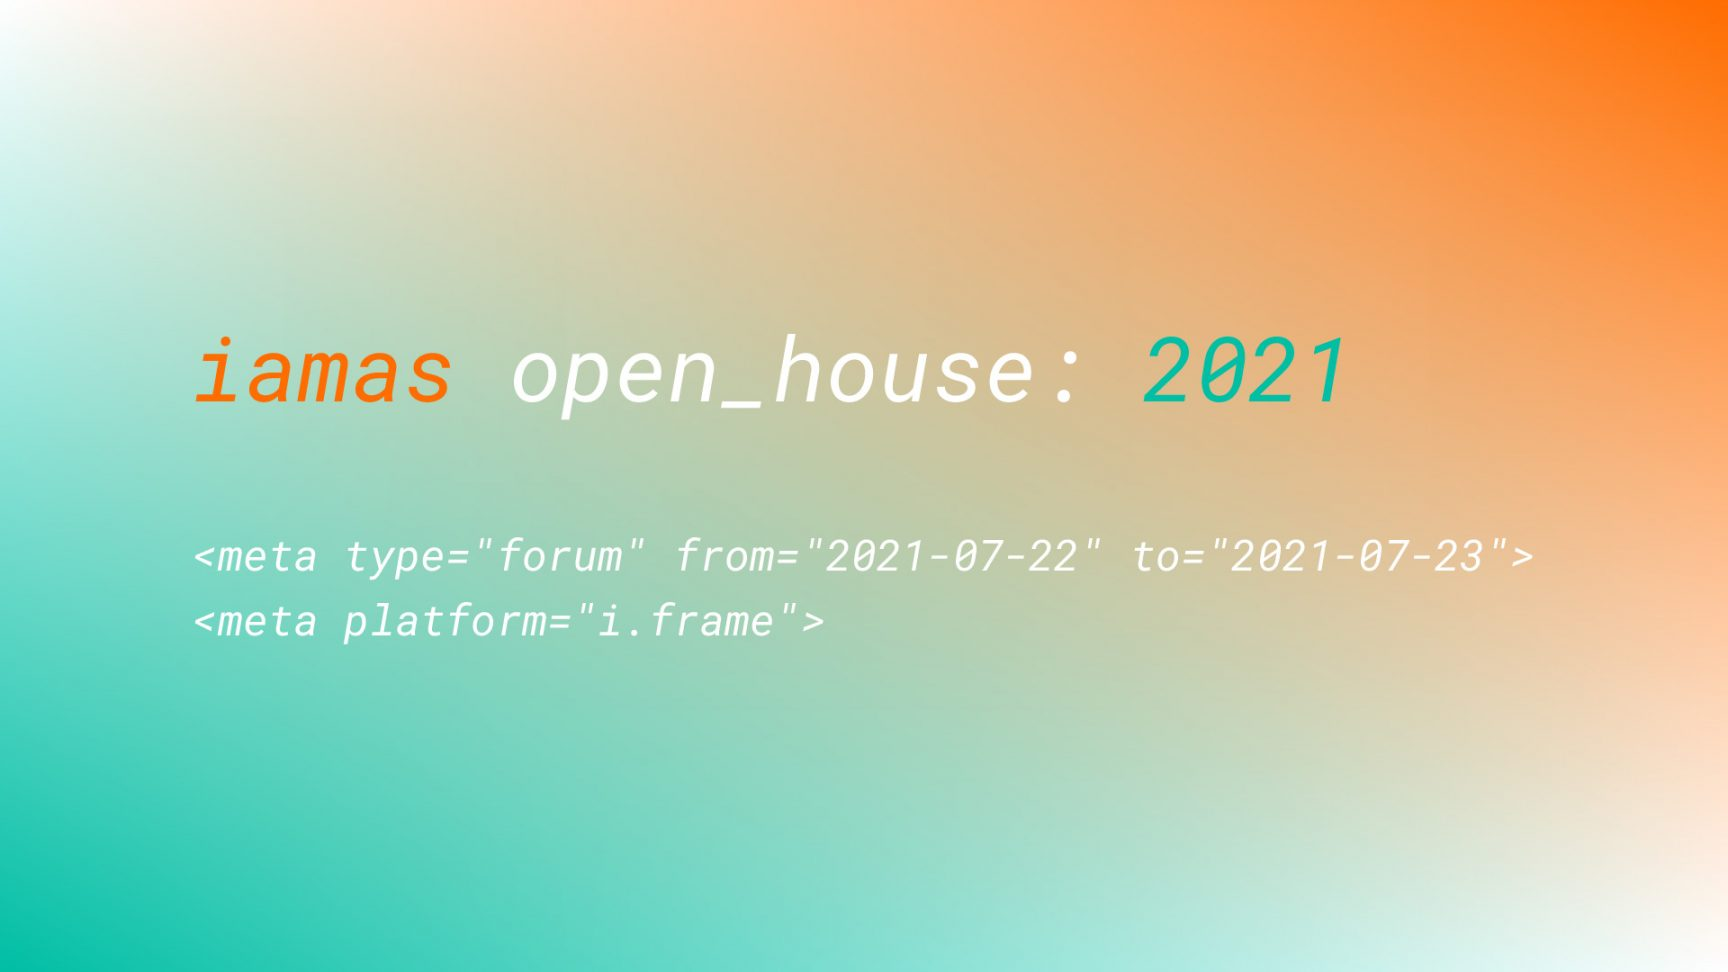 iamas open_house: 2021